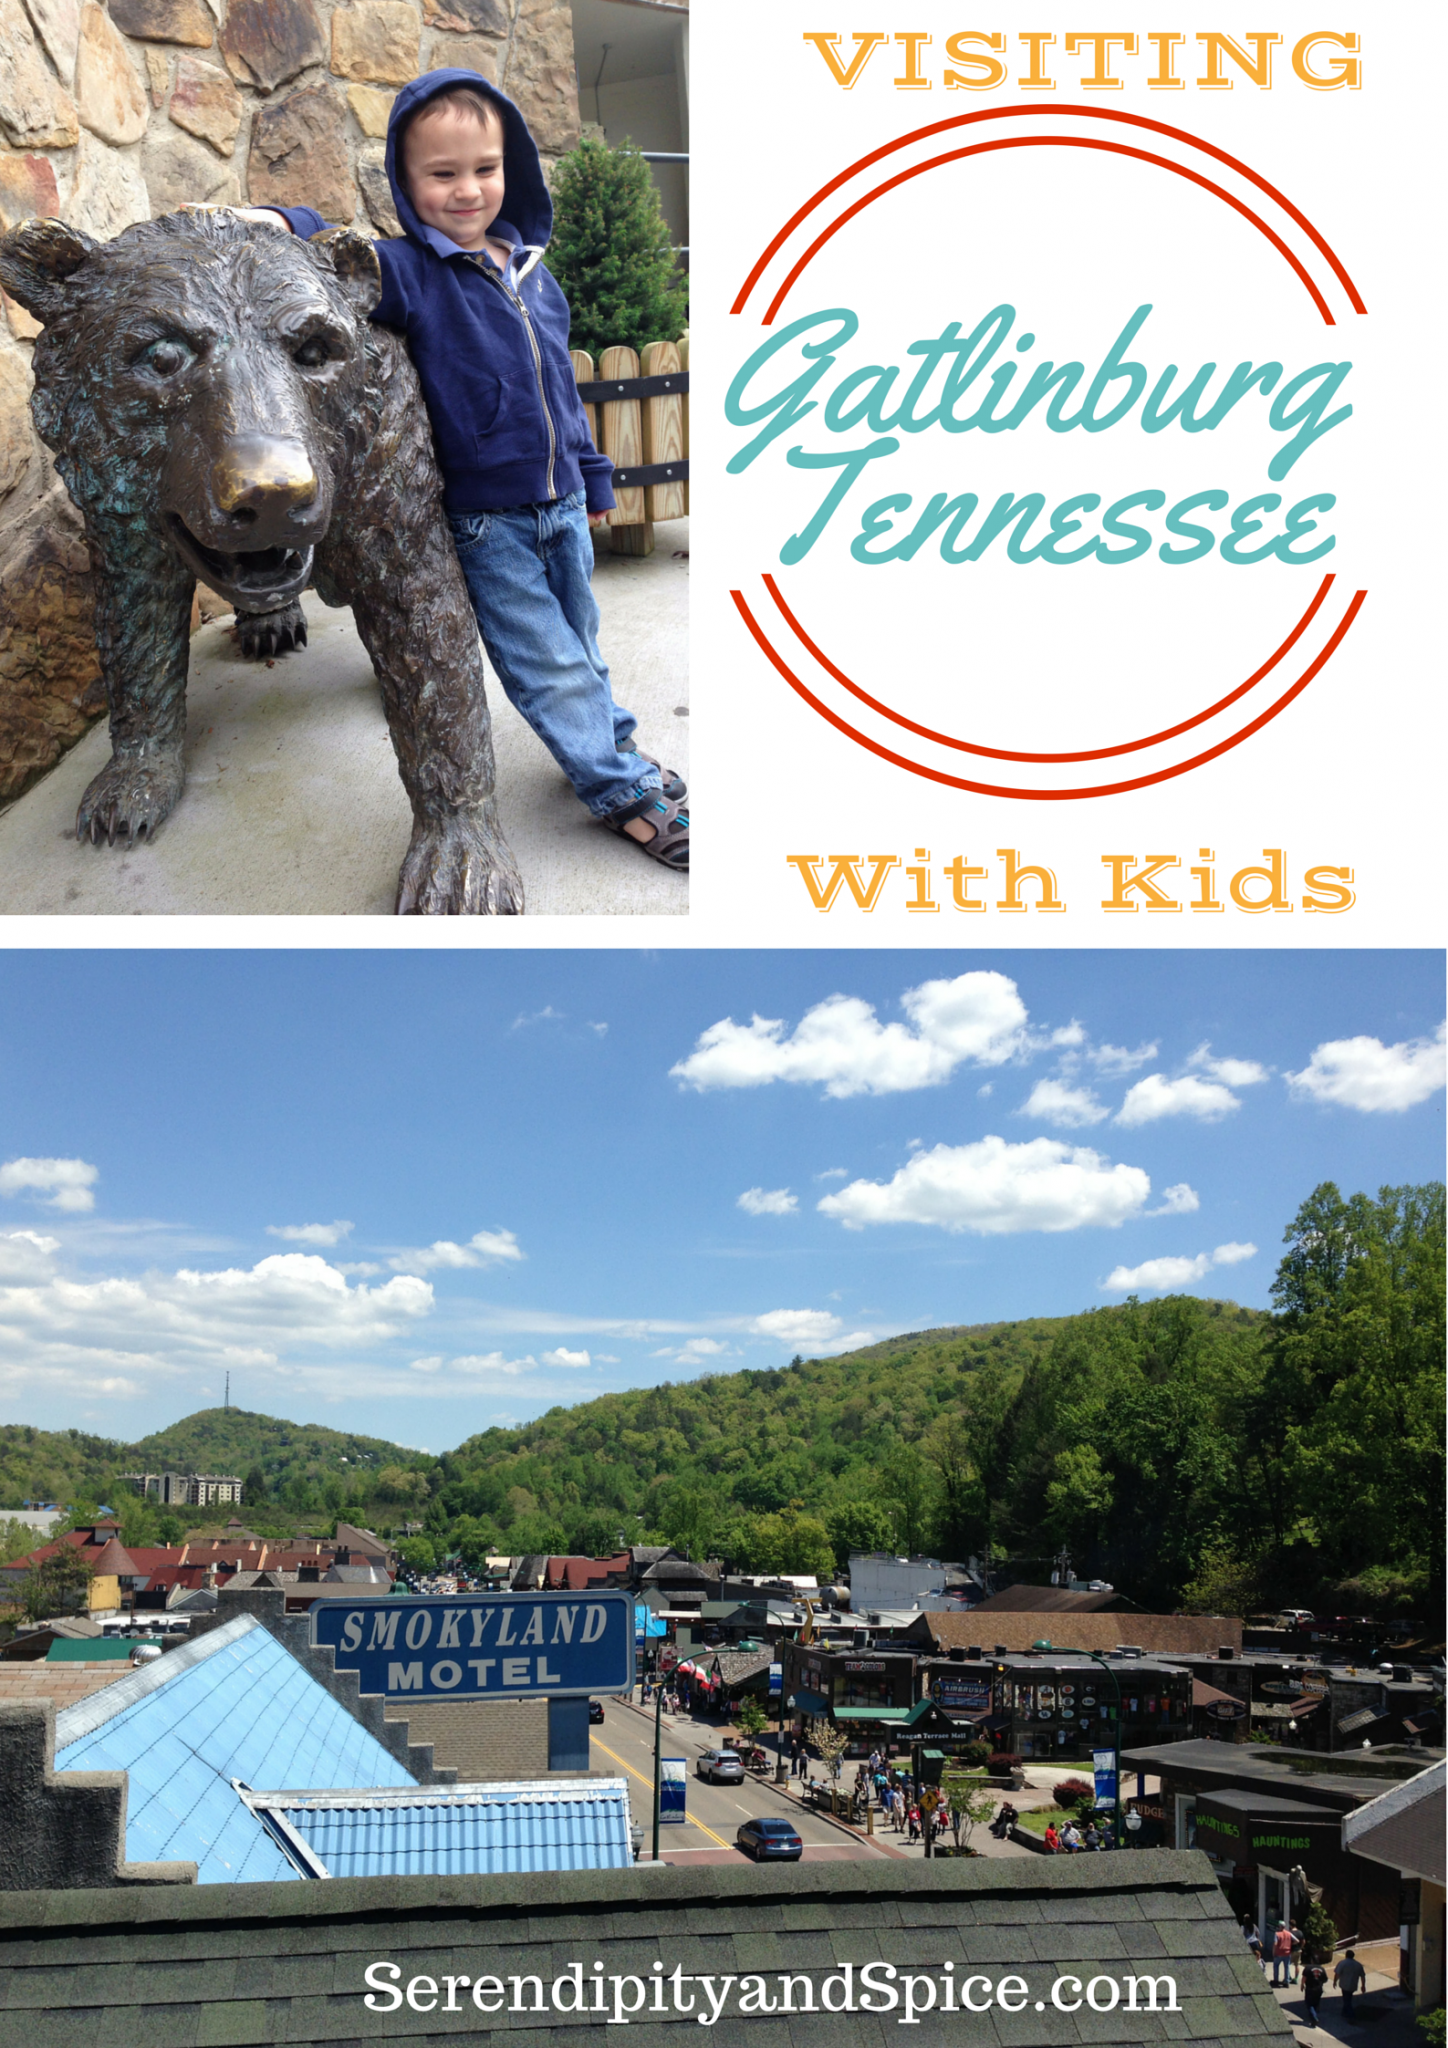 Visit Gatlinburg with Kids